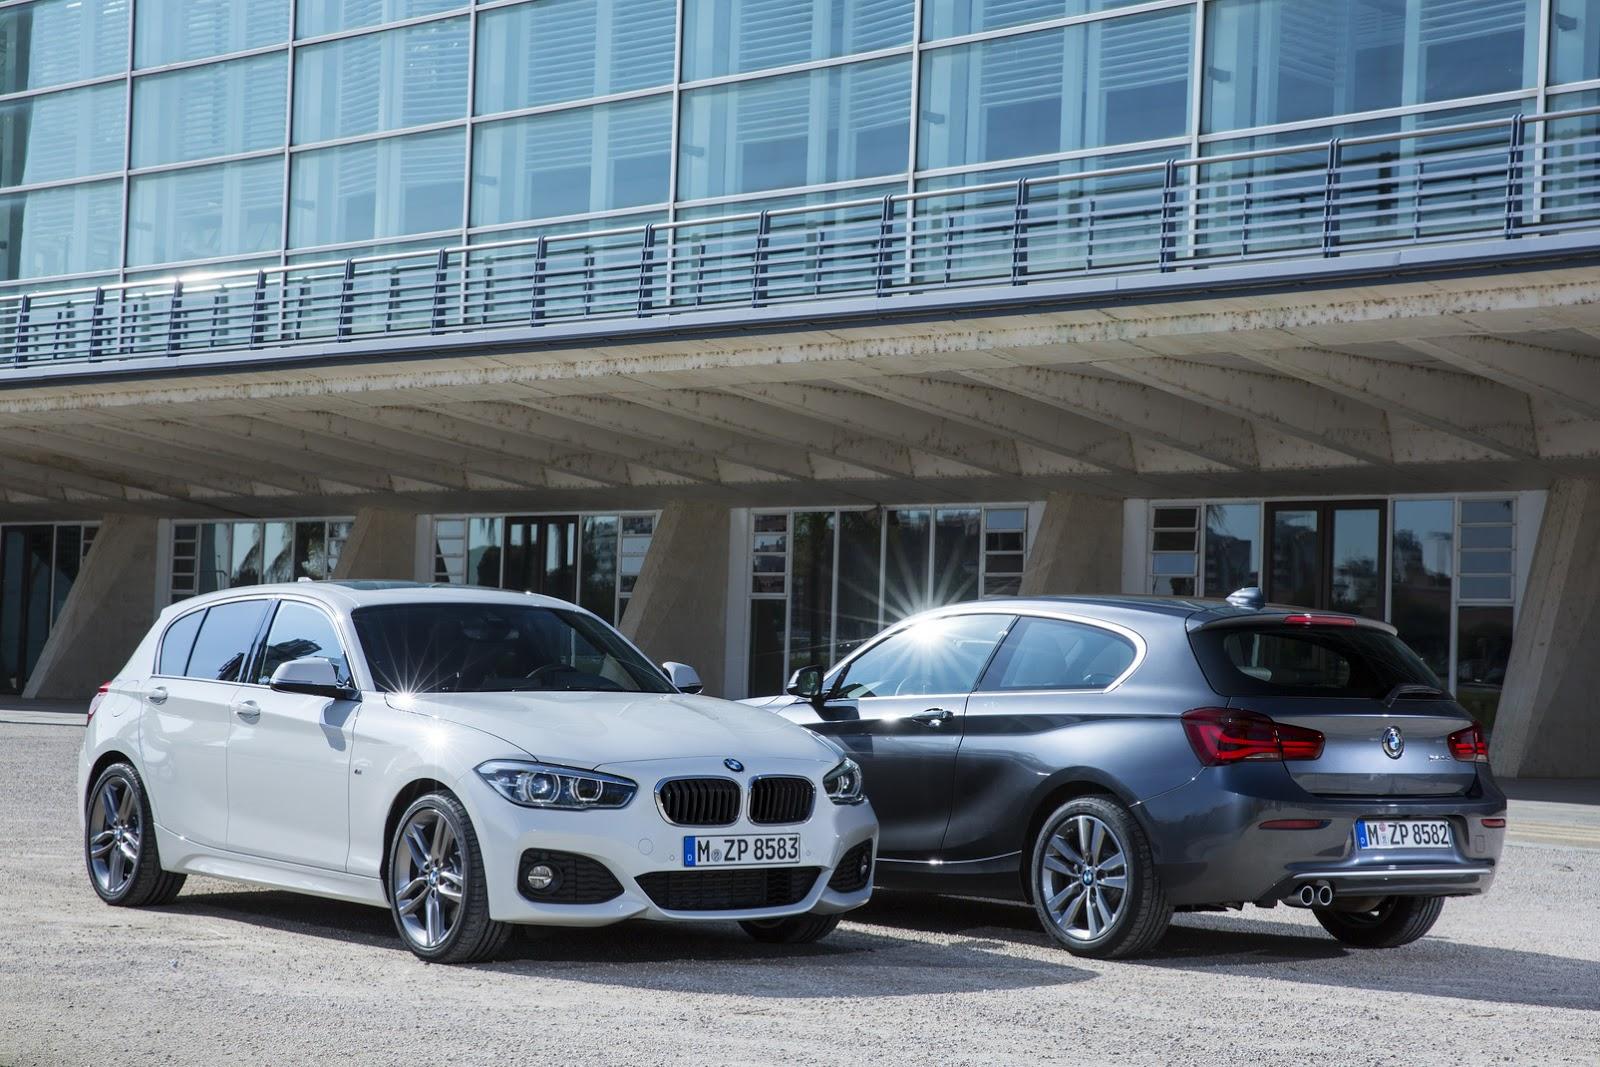 BMW Seria 1 facelift 2015 - floteauto 1